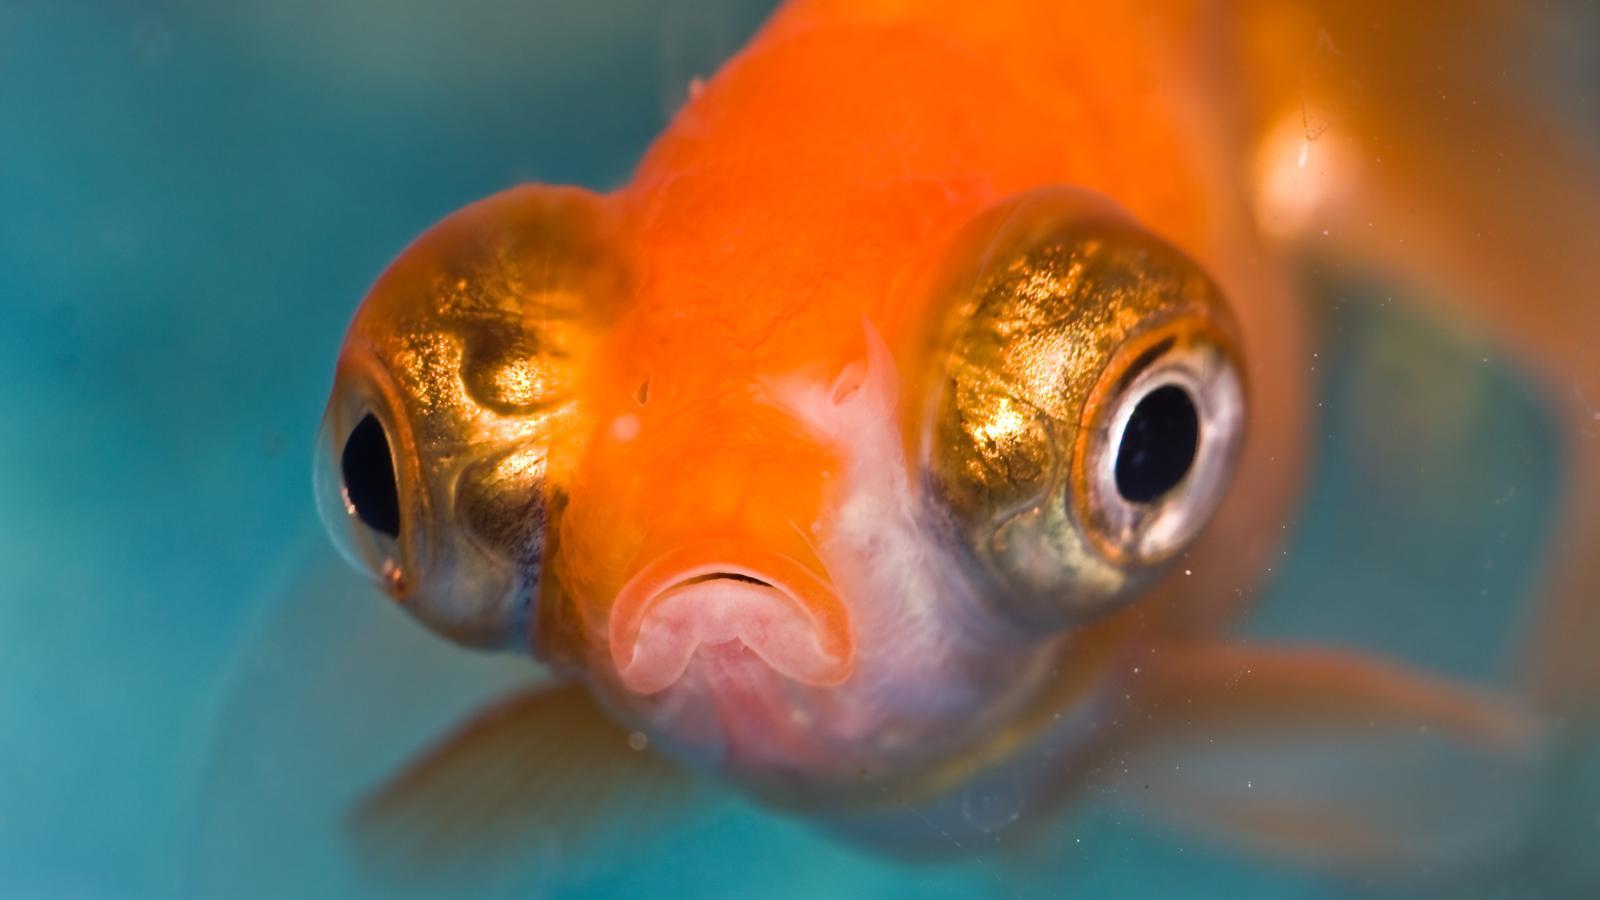 I pesci sentono dolore lo studio di Lynne Sneddon